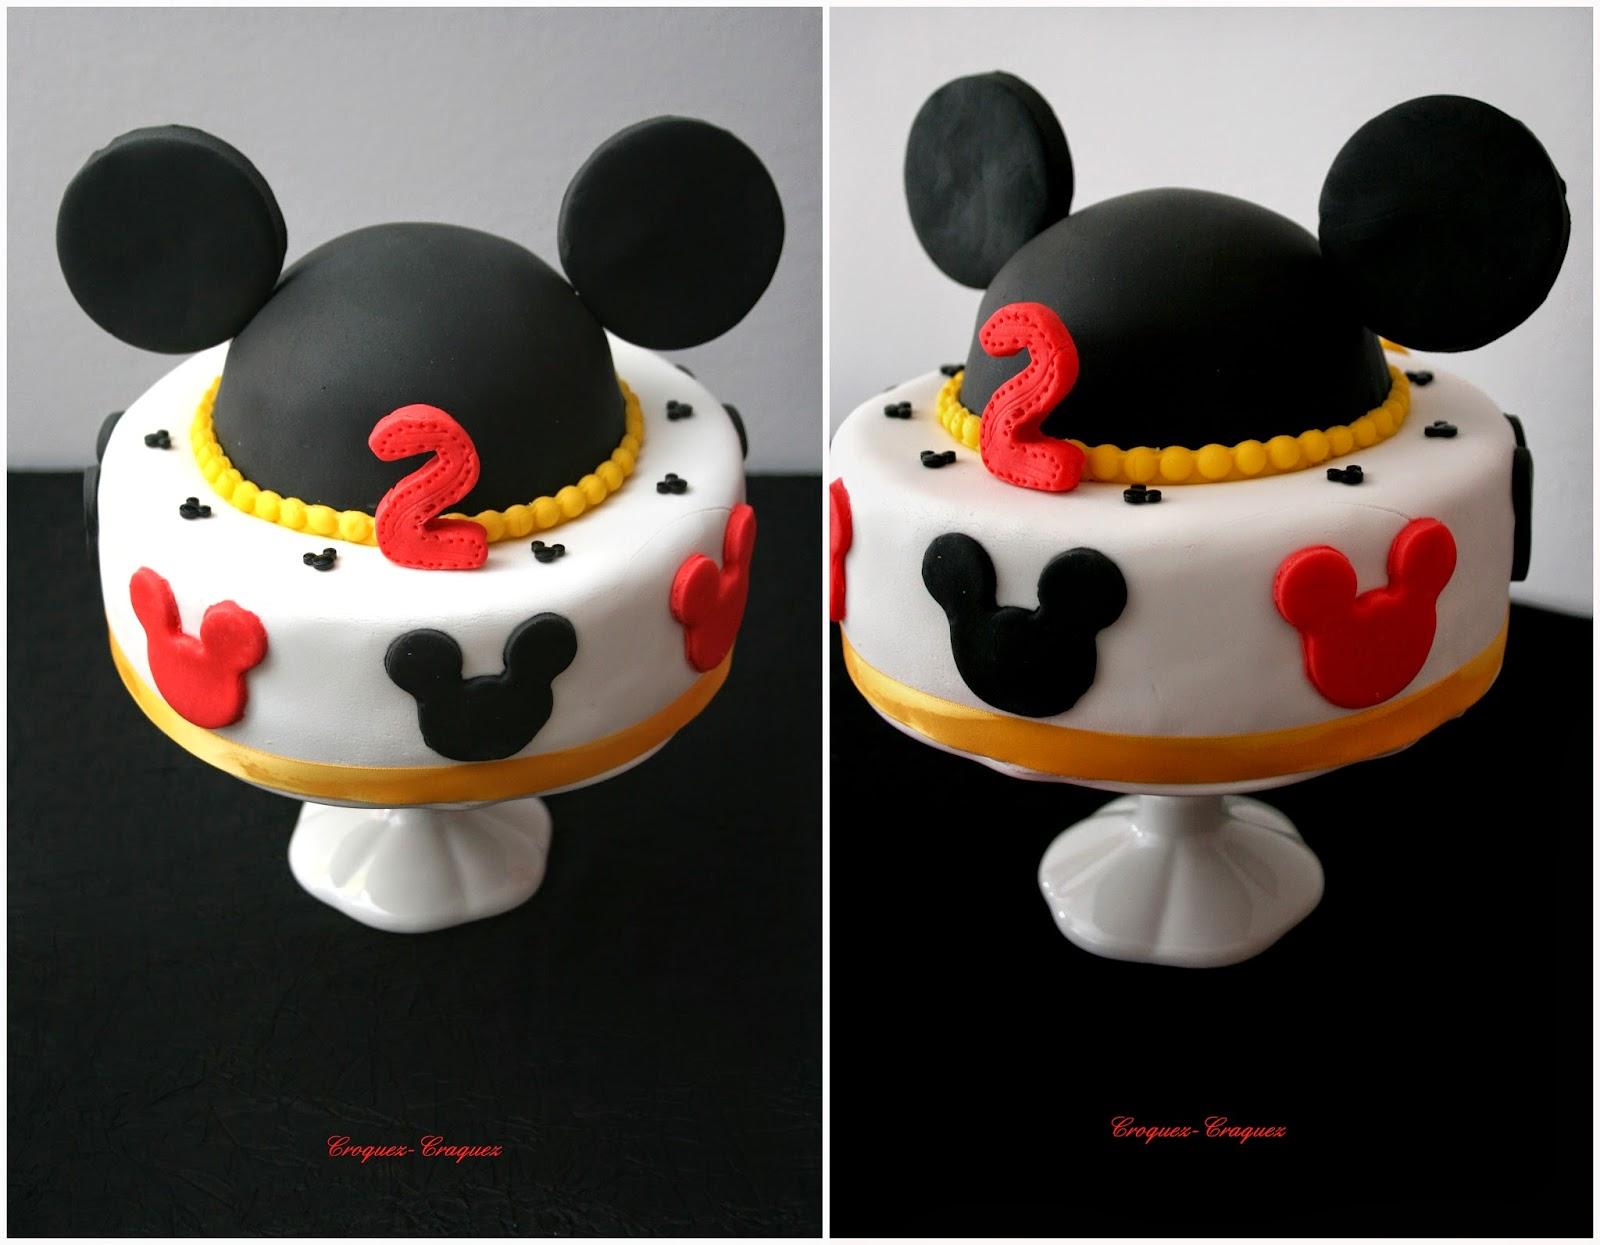 Connu Un anniversaire Mickey ! | Croquez, craquez CN67